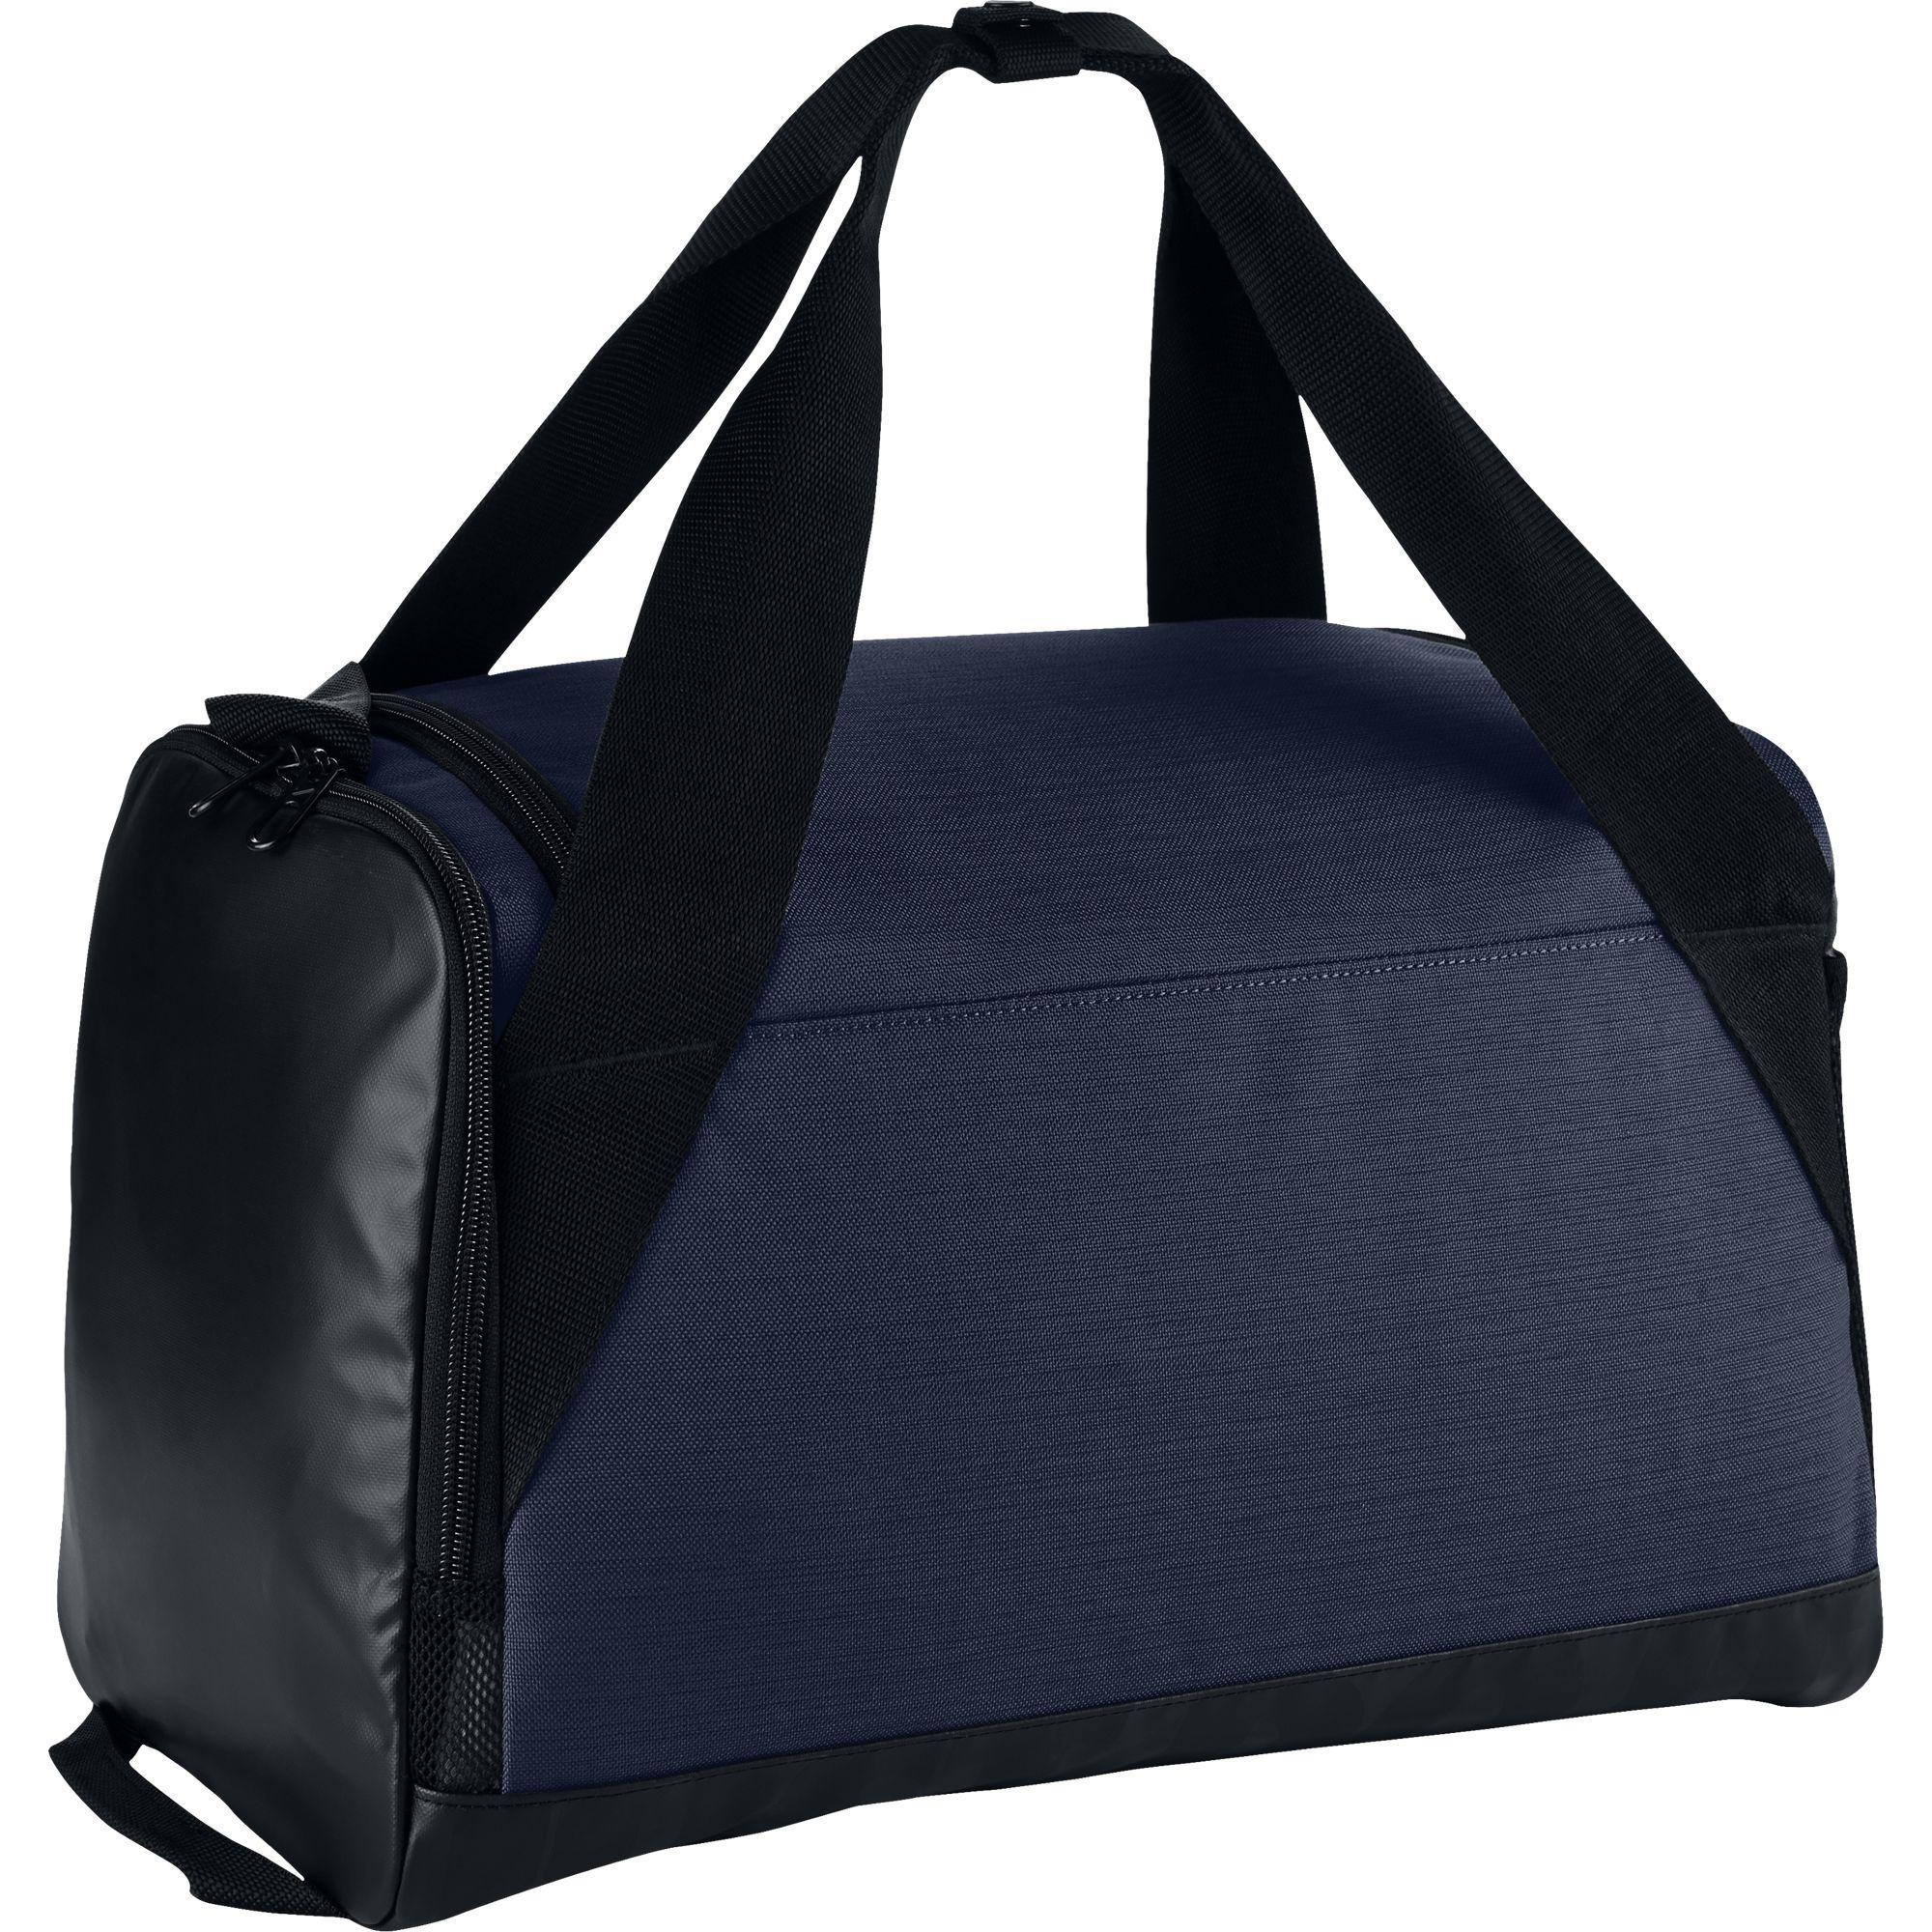 b7d744f0147b Nike Brasilia Extra Small Training Duffel Bag - Midnight Navy Black -  Tennisnuts.com